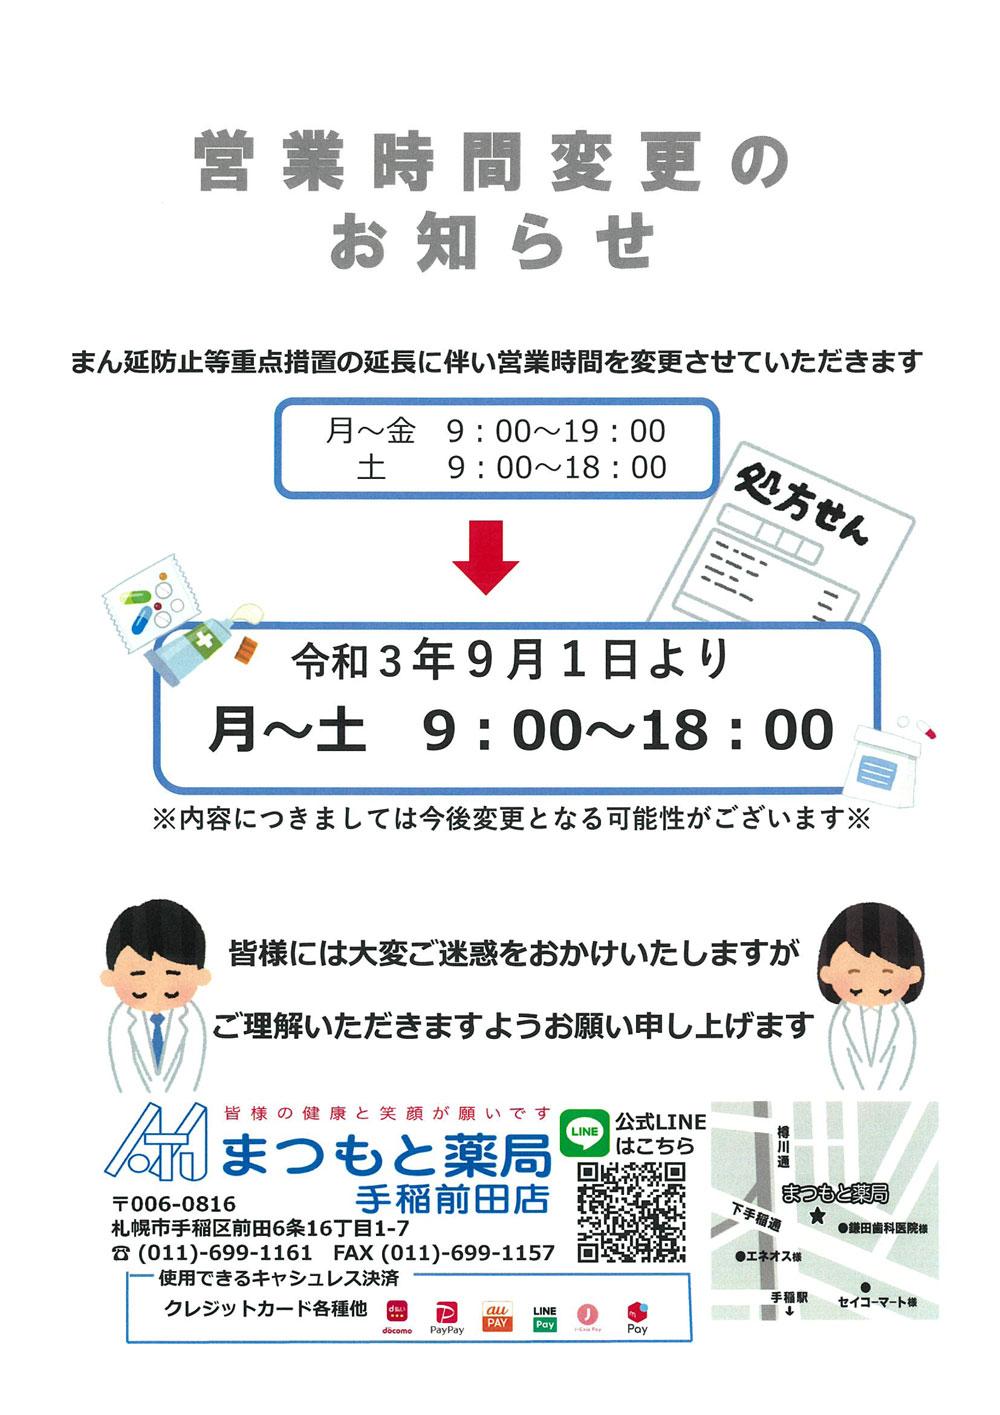 https://www.matumoto.info/information/images/3f2be35f14bec4c7d5f3718200a9bab2eb36a770.jpg